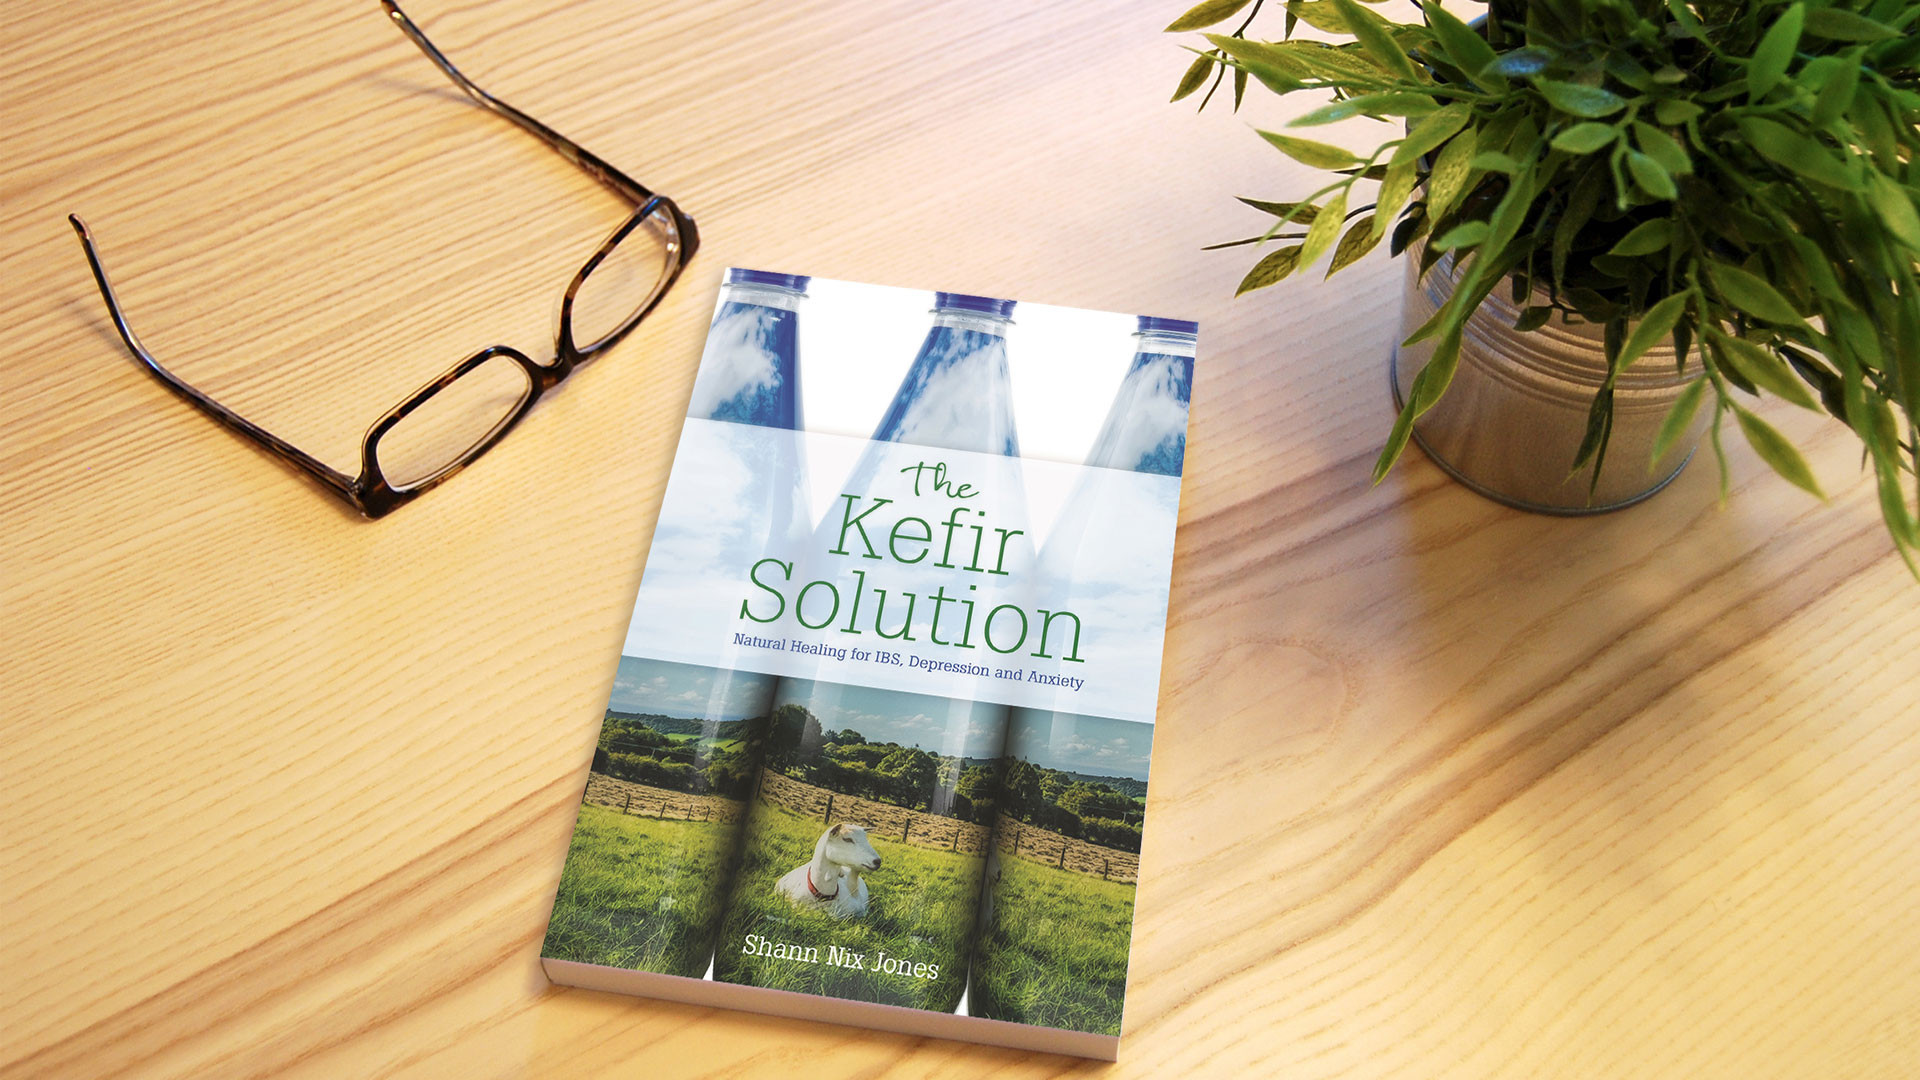 Shann Nix Jones' latest book, The Kefir Solution